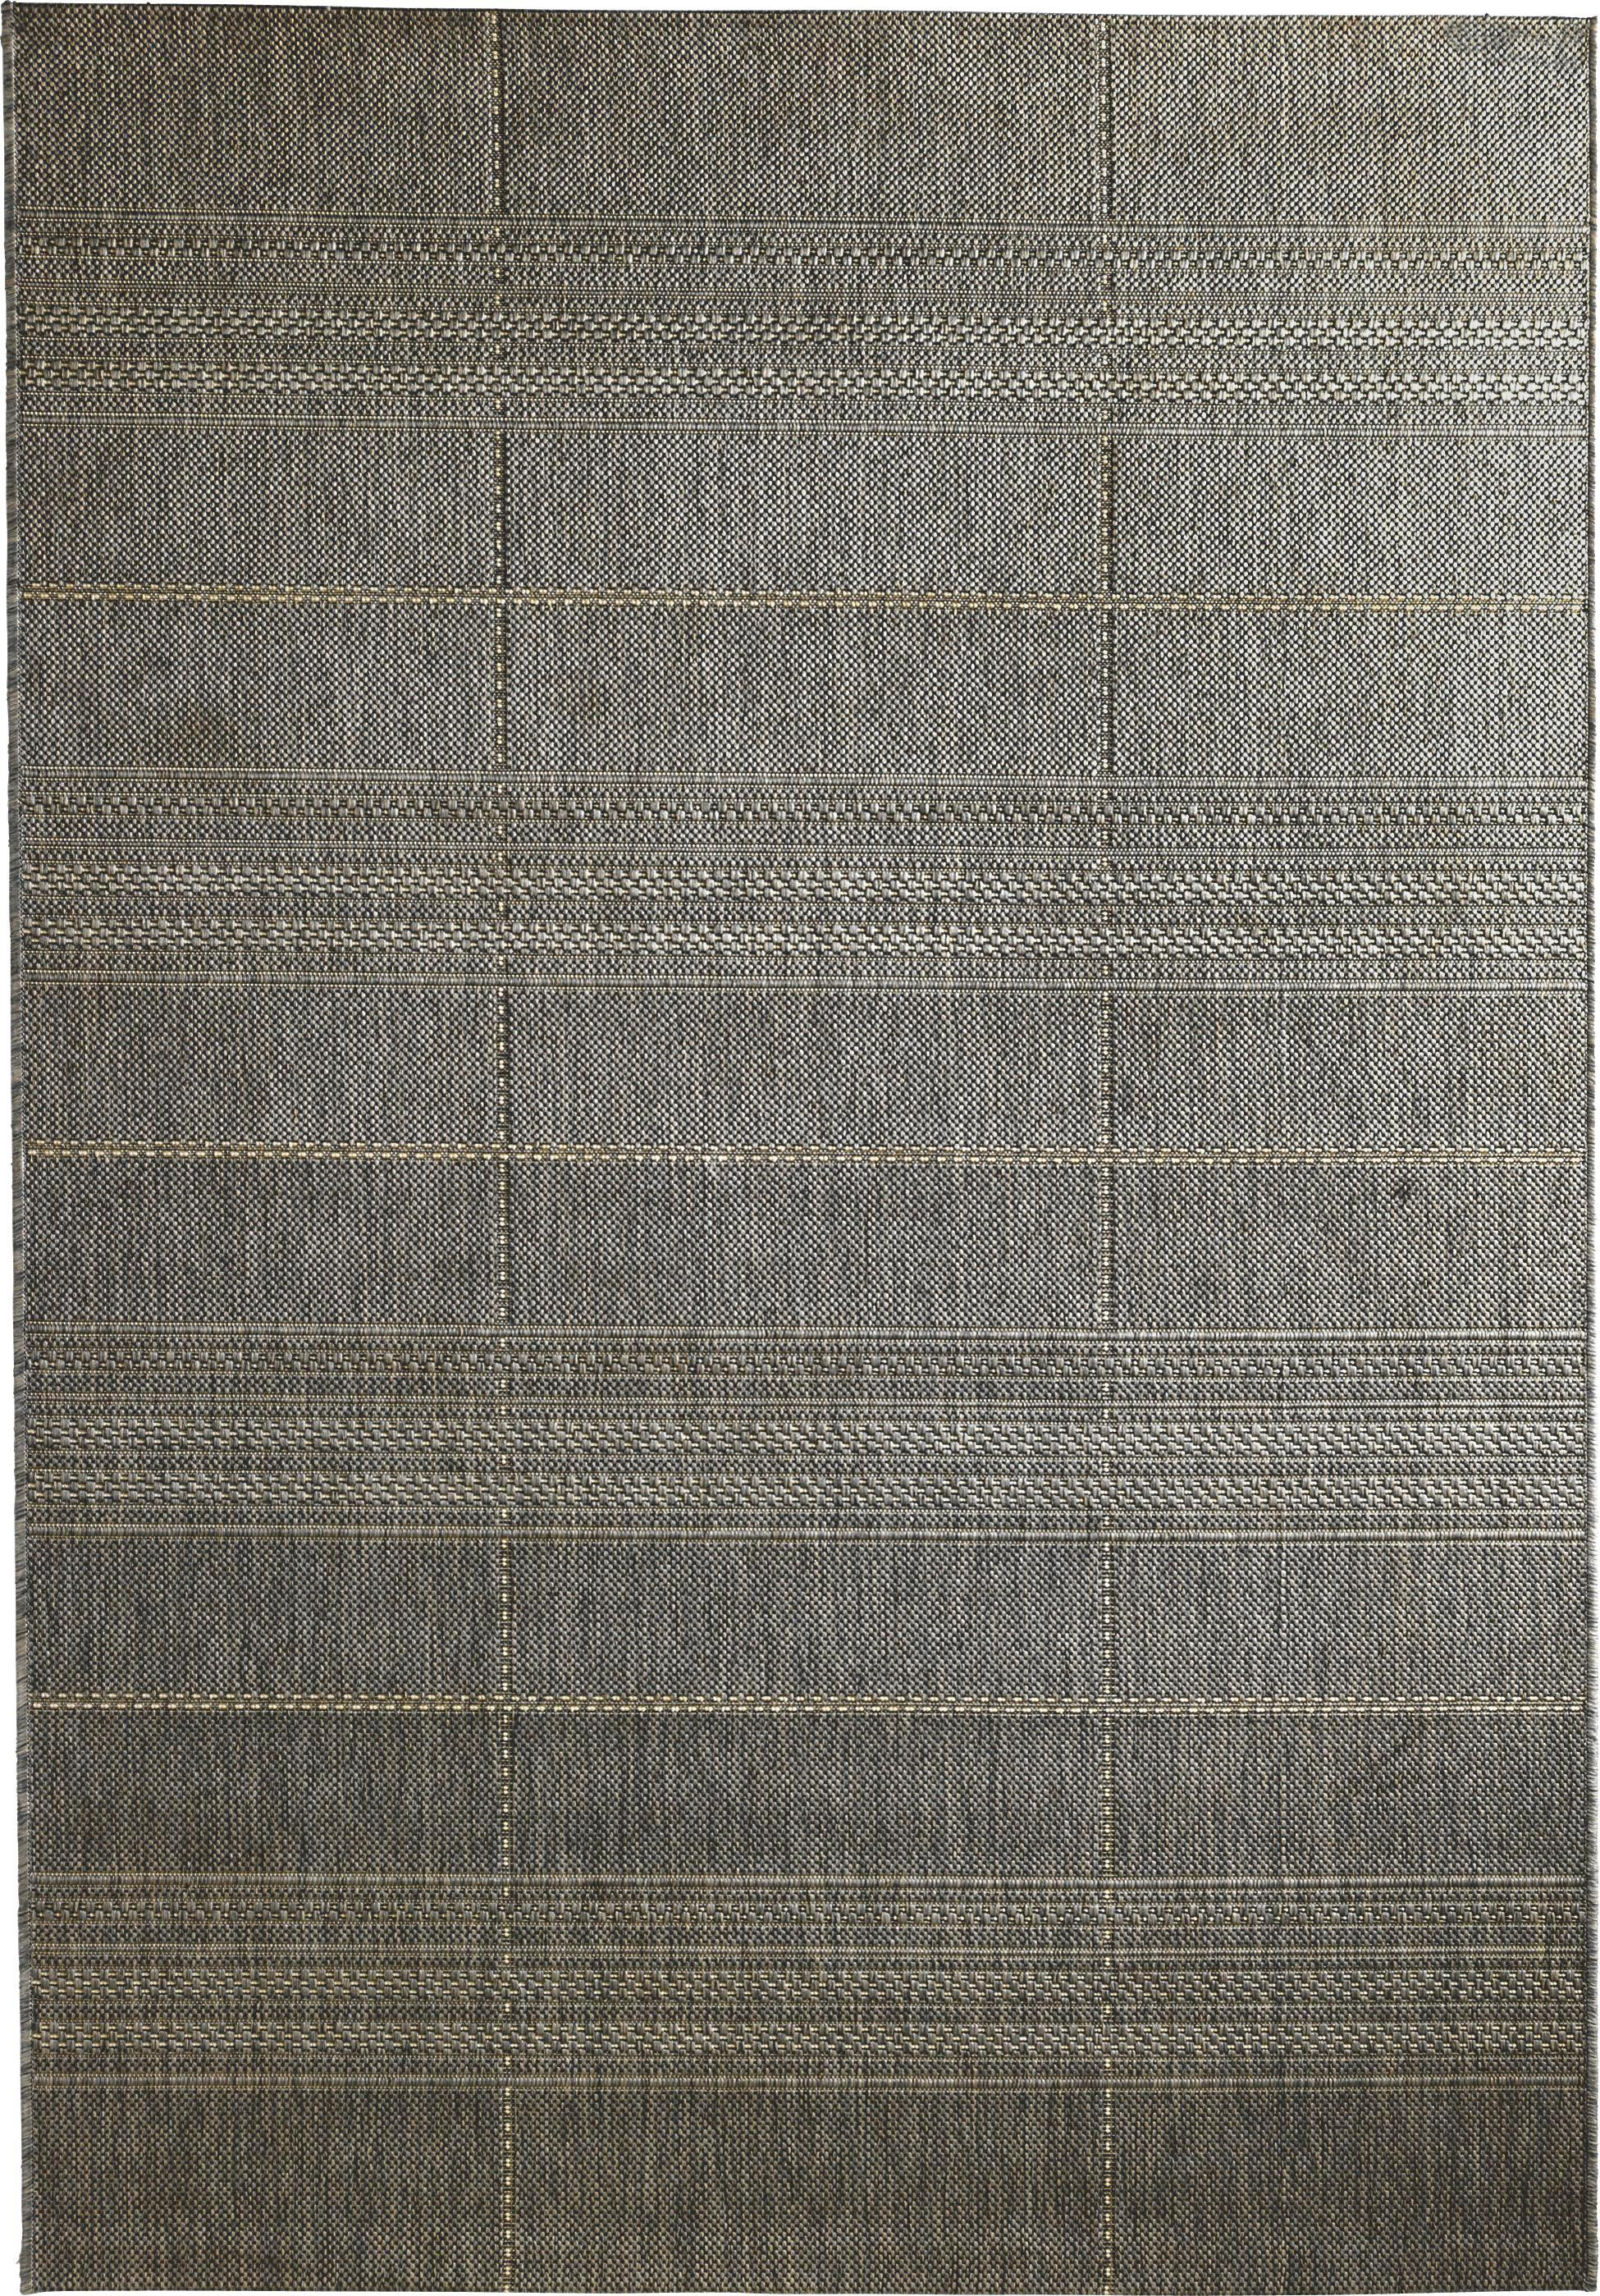 Szőnyeg Essenza - szürke, modern (120/170cm) - MÖMAX modern living